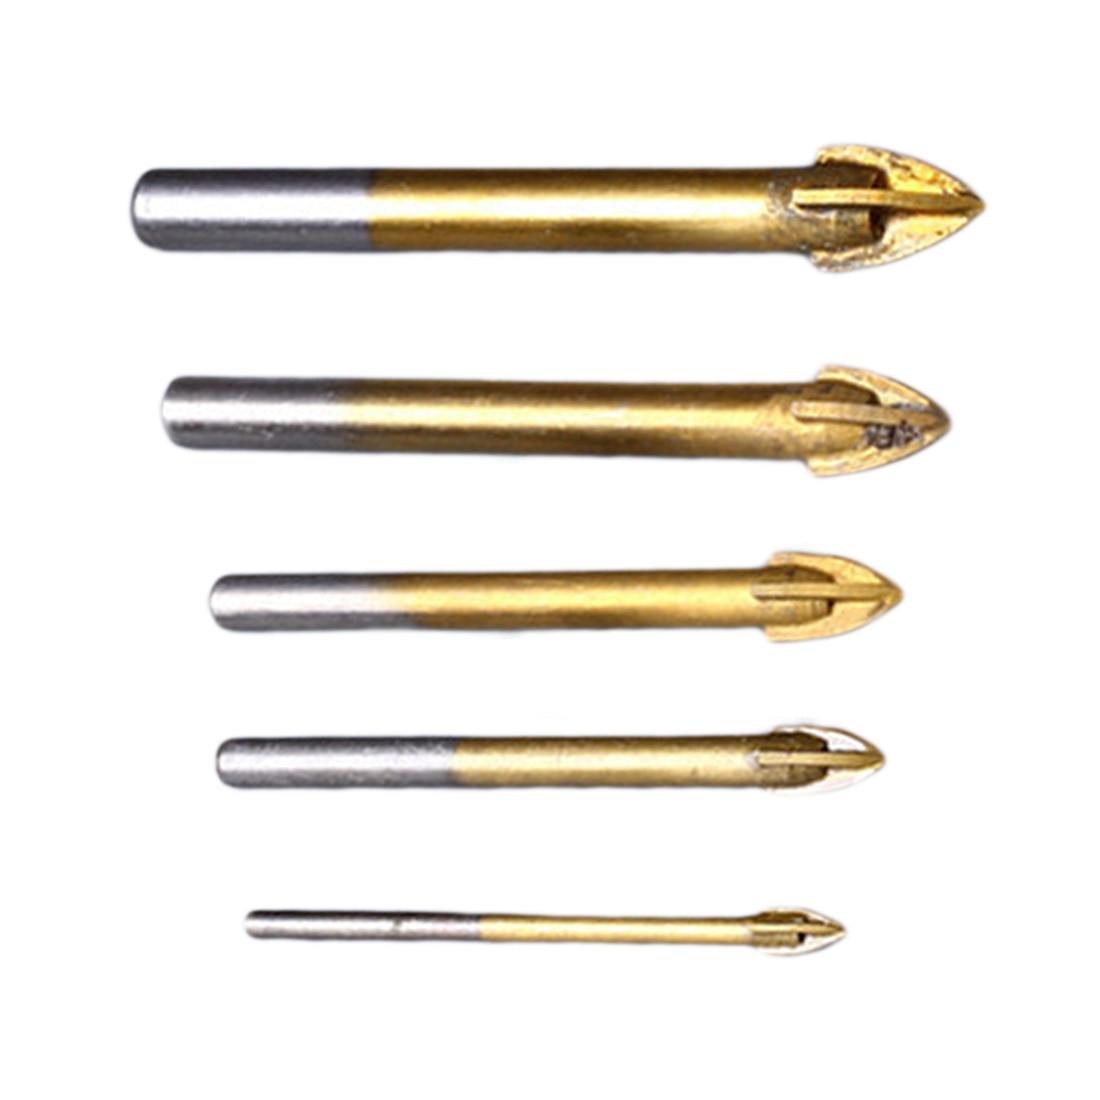 Titanium Ceramic Tile Glass Marble Drill Bit Tungsten Carbide Cross Spear Head 5/6/8/10/12mm